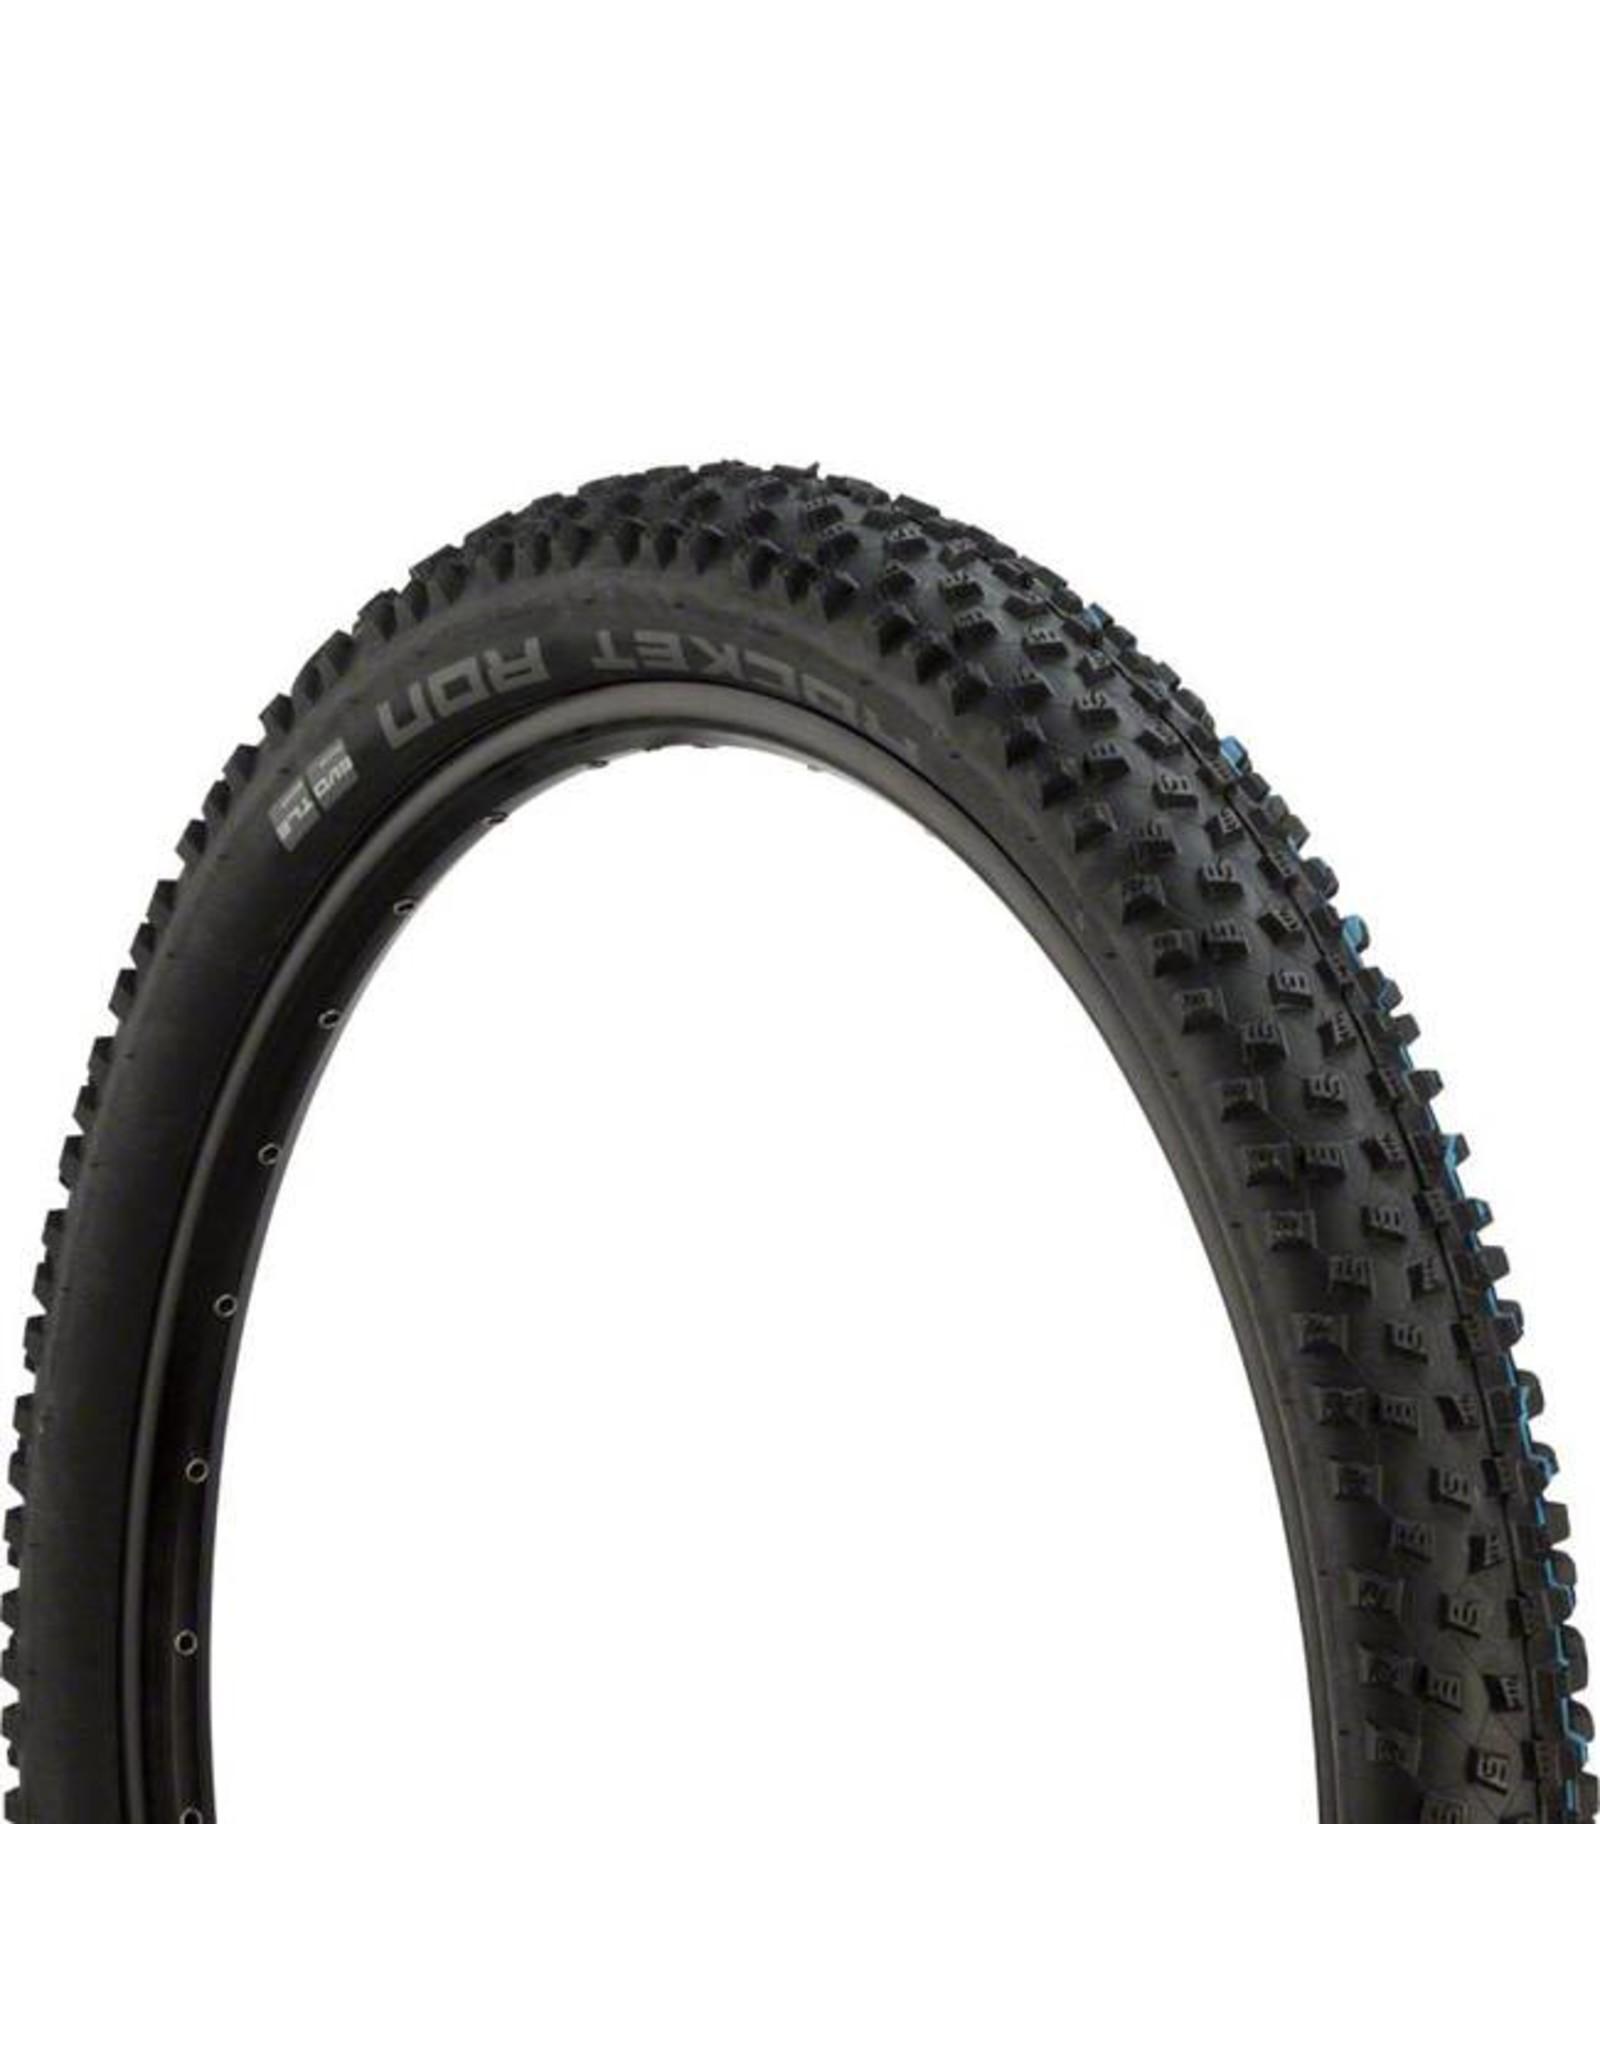 "Schwalbe Schwalbe Rocket Ron Tire: 27.5 x 2.60"", Folding Bead, Evolution Line, Addix Speed Compound, SnakeSkin, Tubeless Easy, Black"